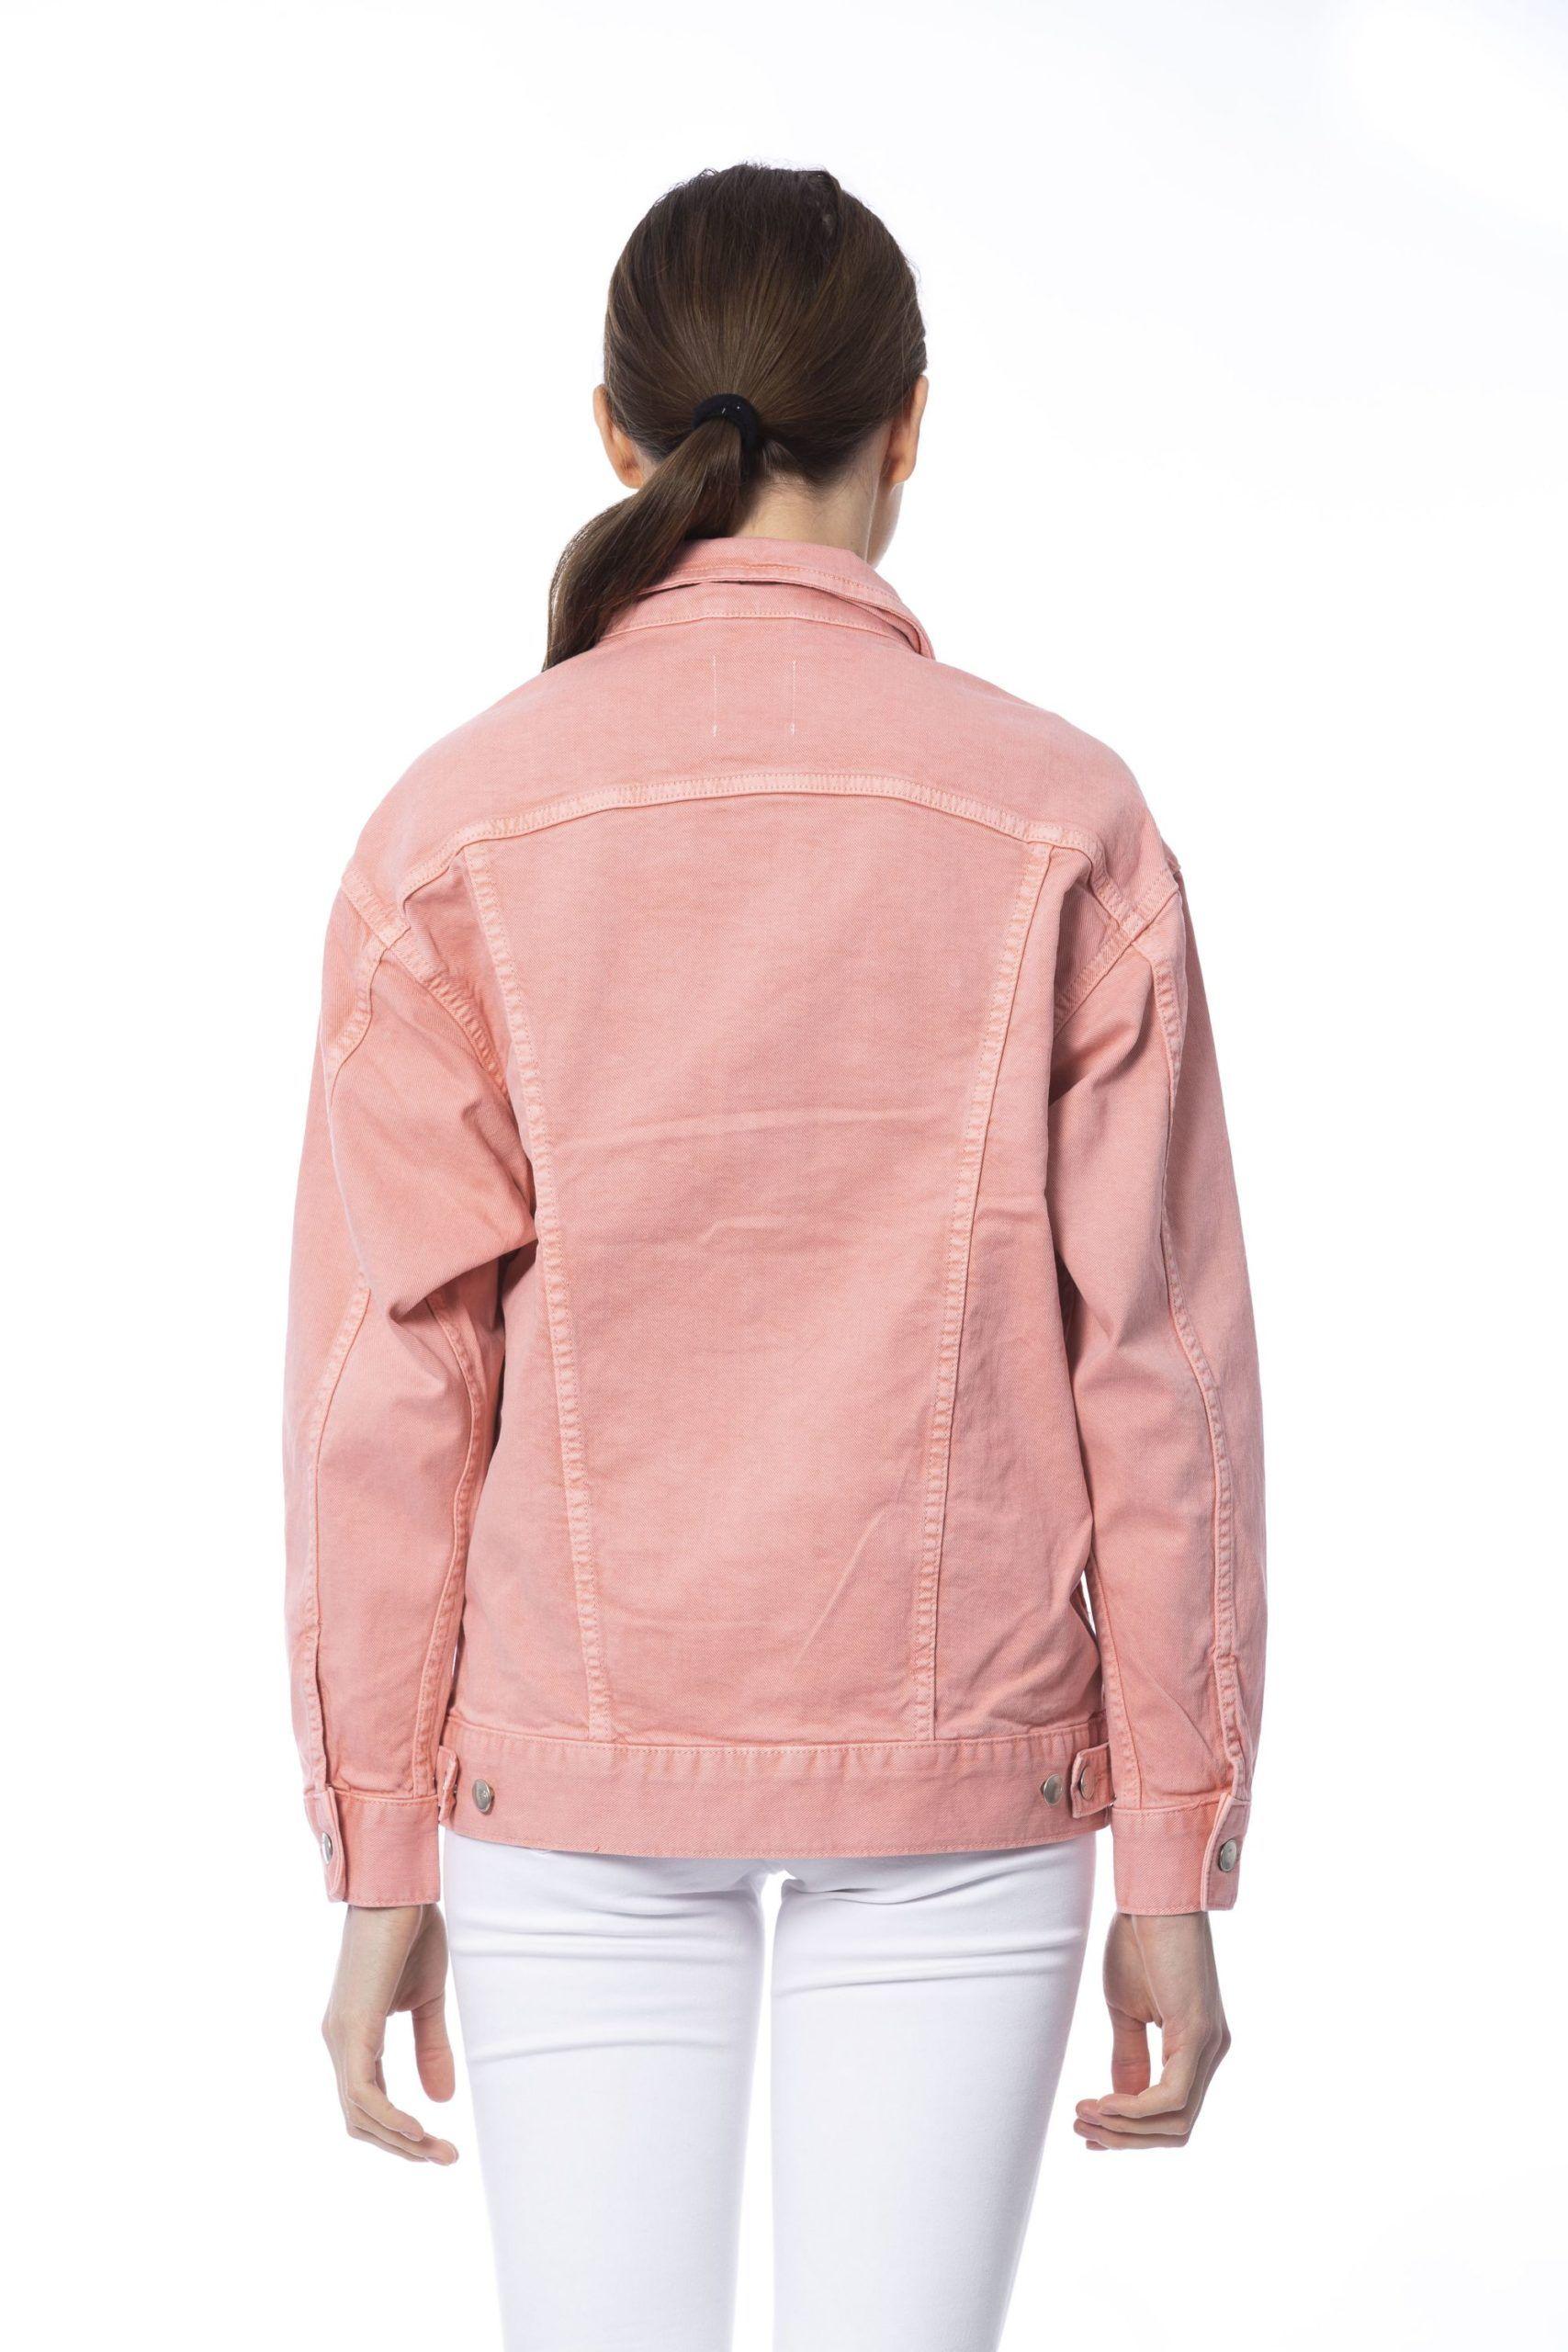 Silvian Heach Pinklight Jackets & Coat